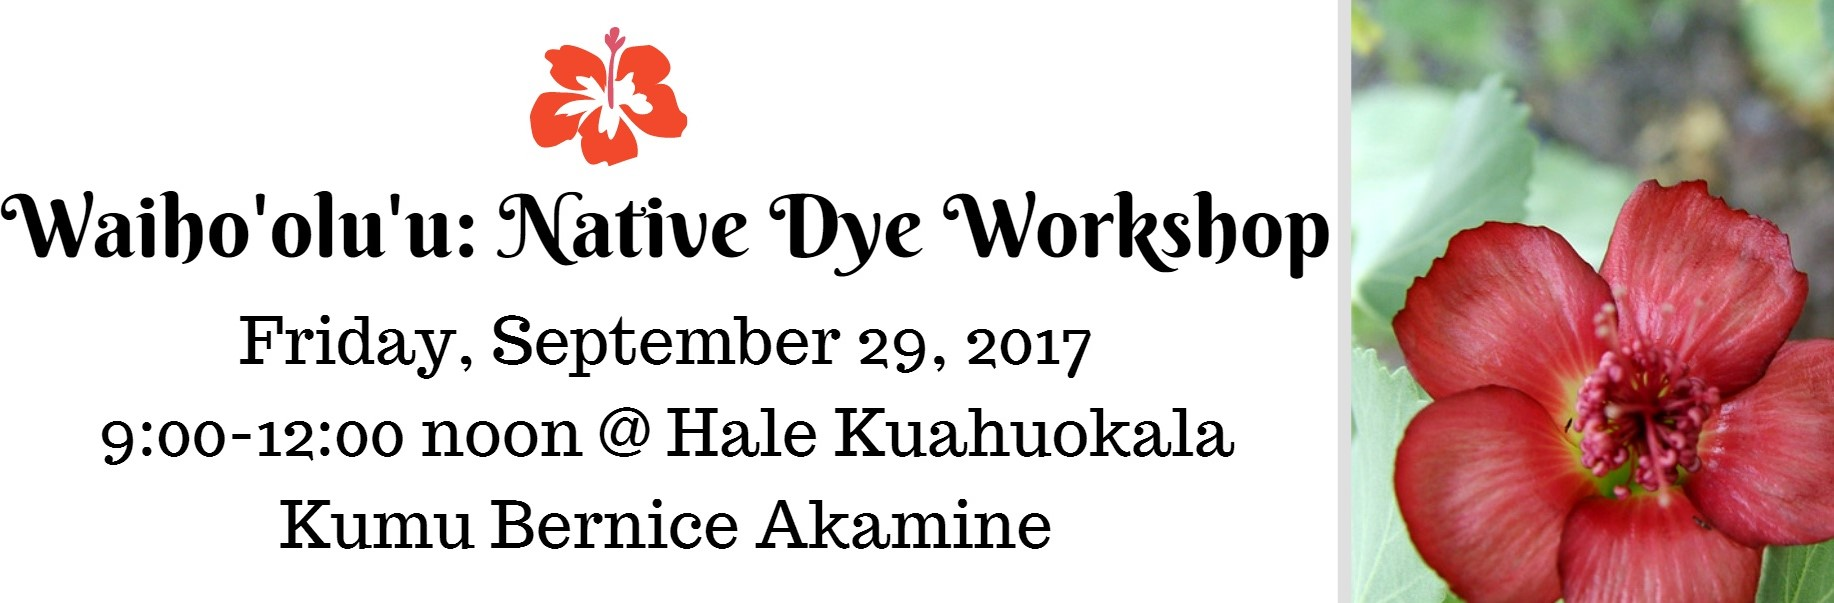 Fyler for Dye Workshop